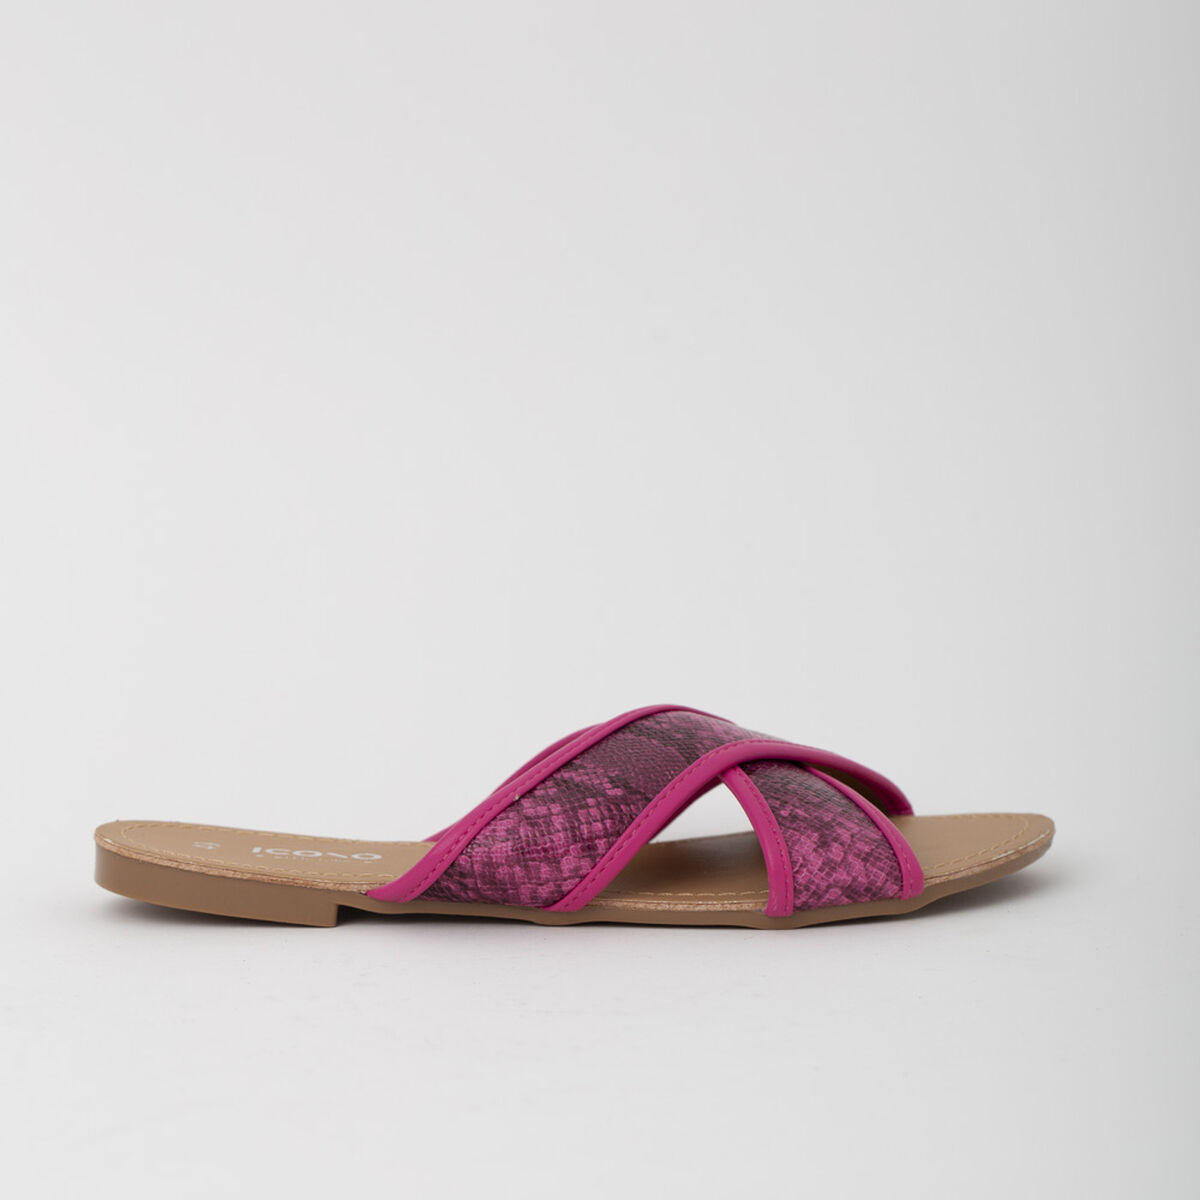 Sandalia Mujer Icono